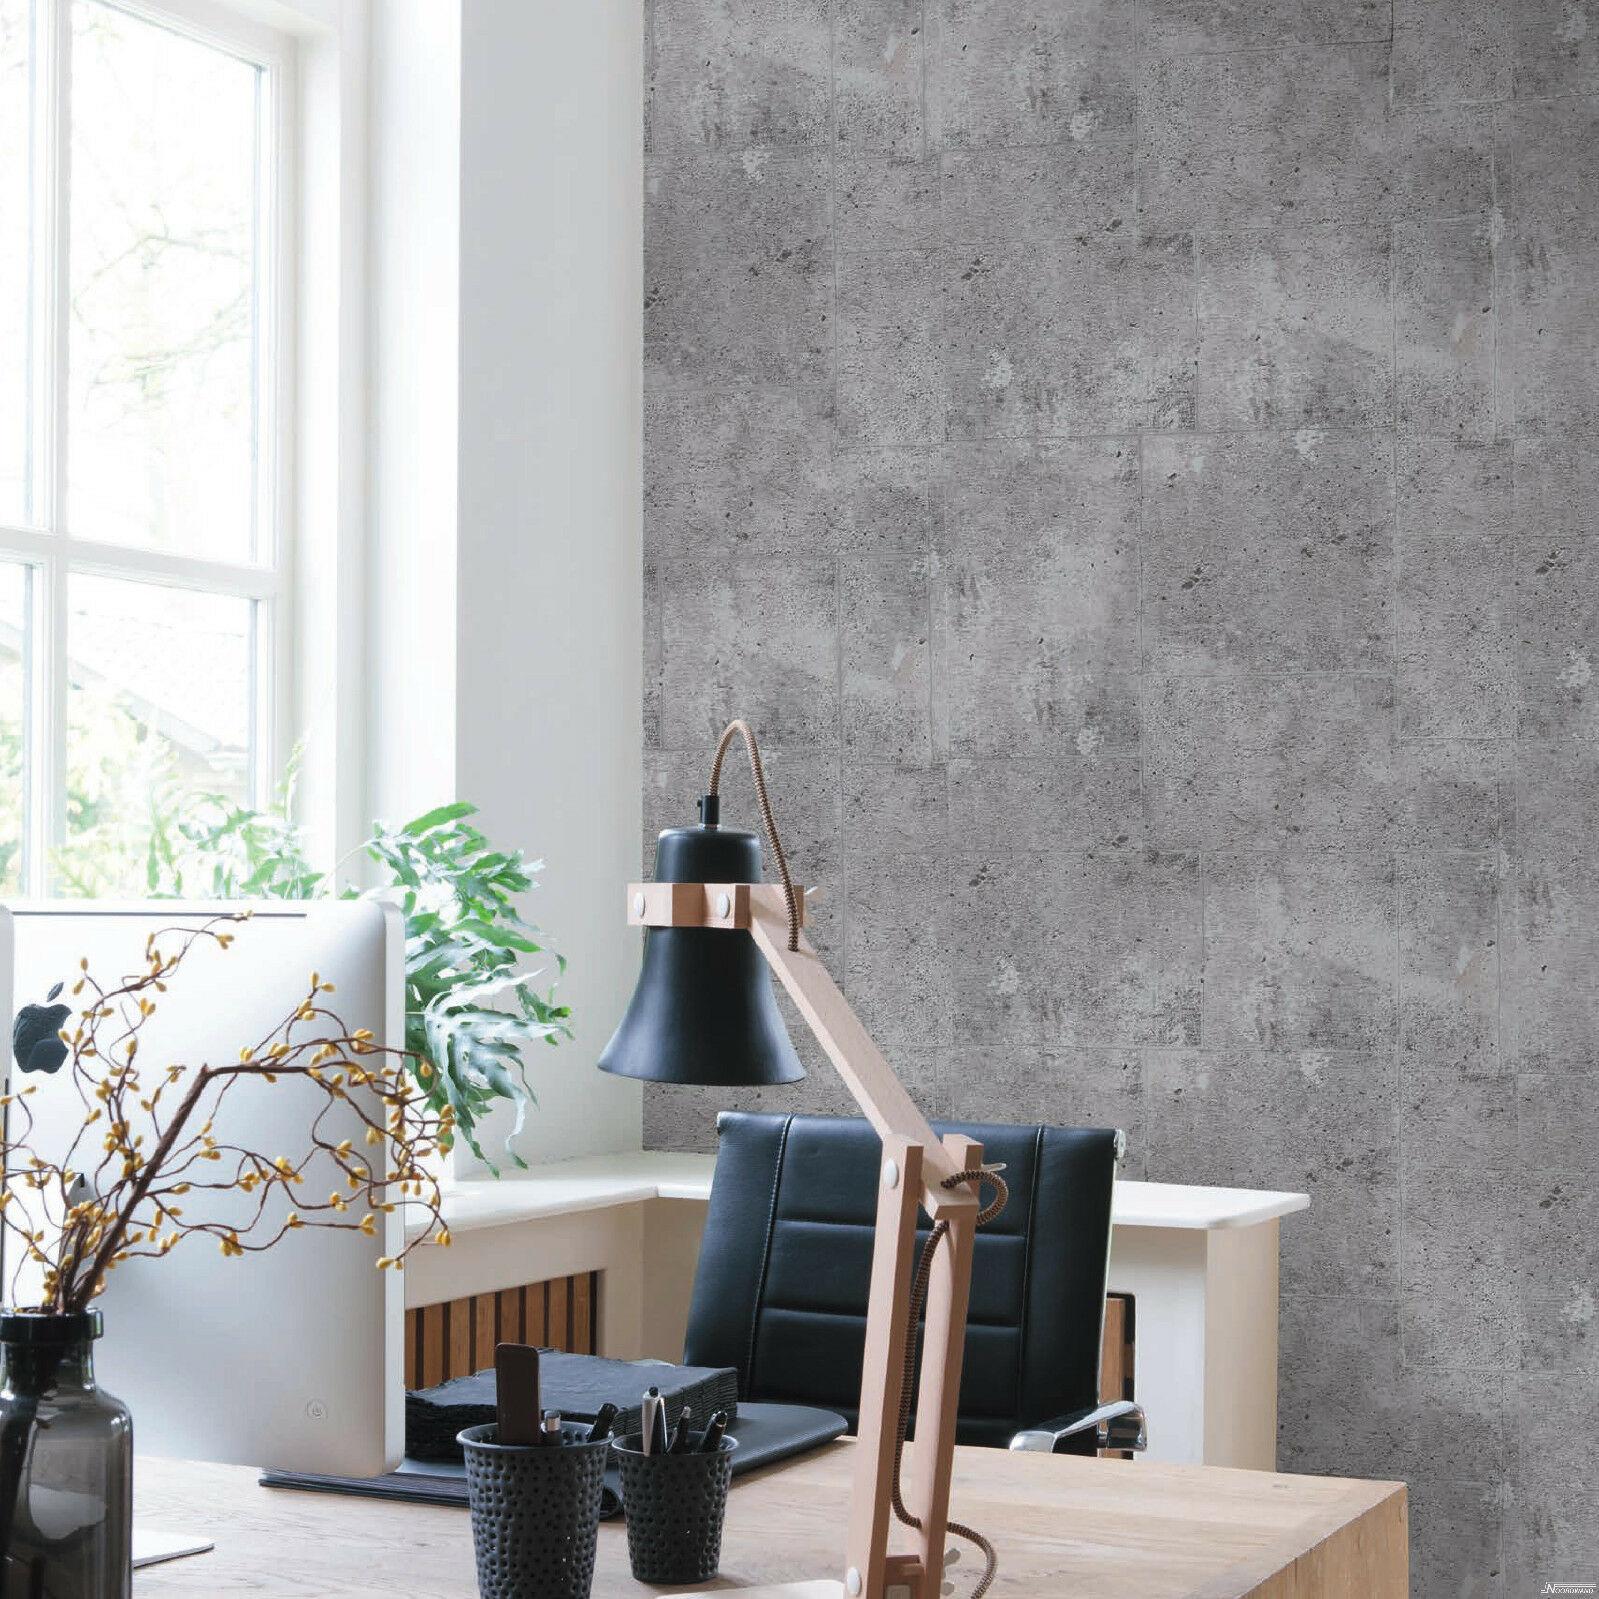 Betonoptik Wand vliestapete beton optik grau betontapete industrial loft stein wand